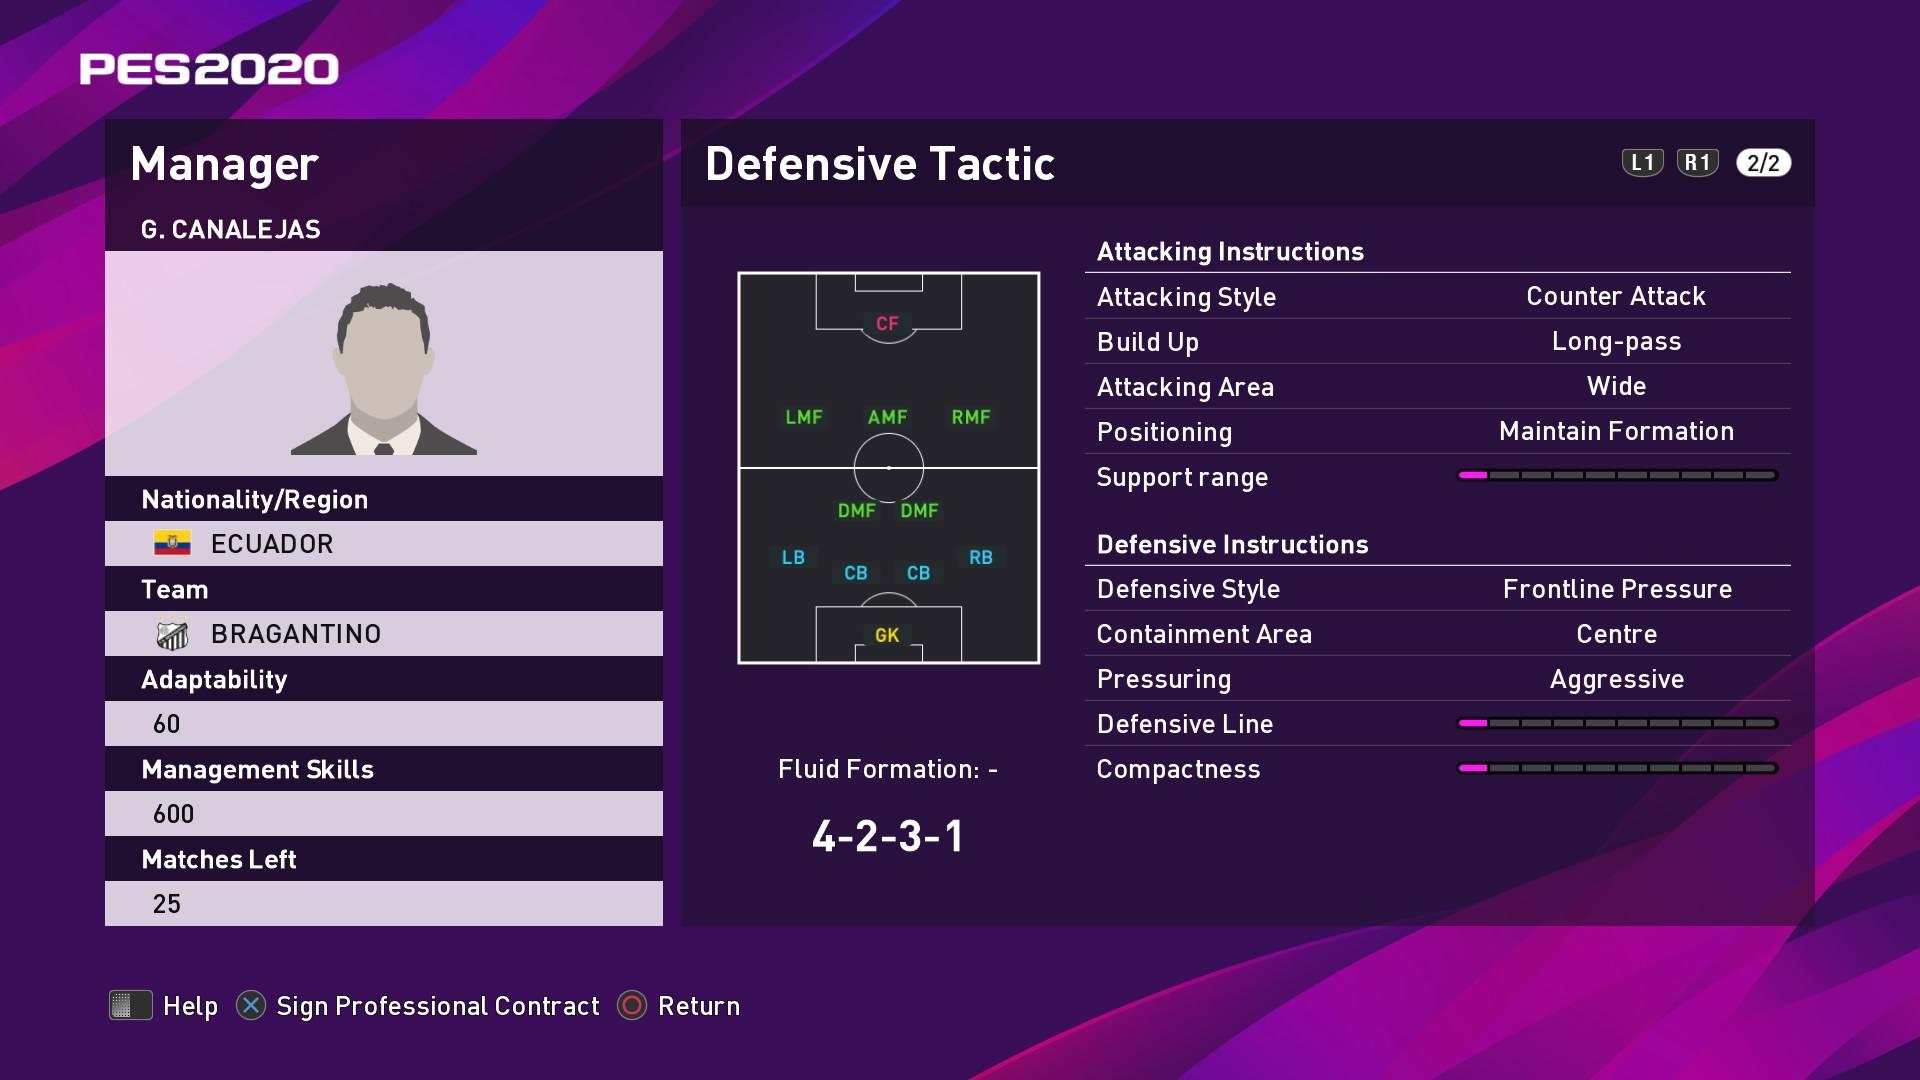 G. Canalejas (Vinicius Munhoz) Defensive Tactic in PES 2020 myClub